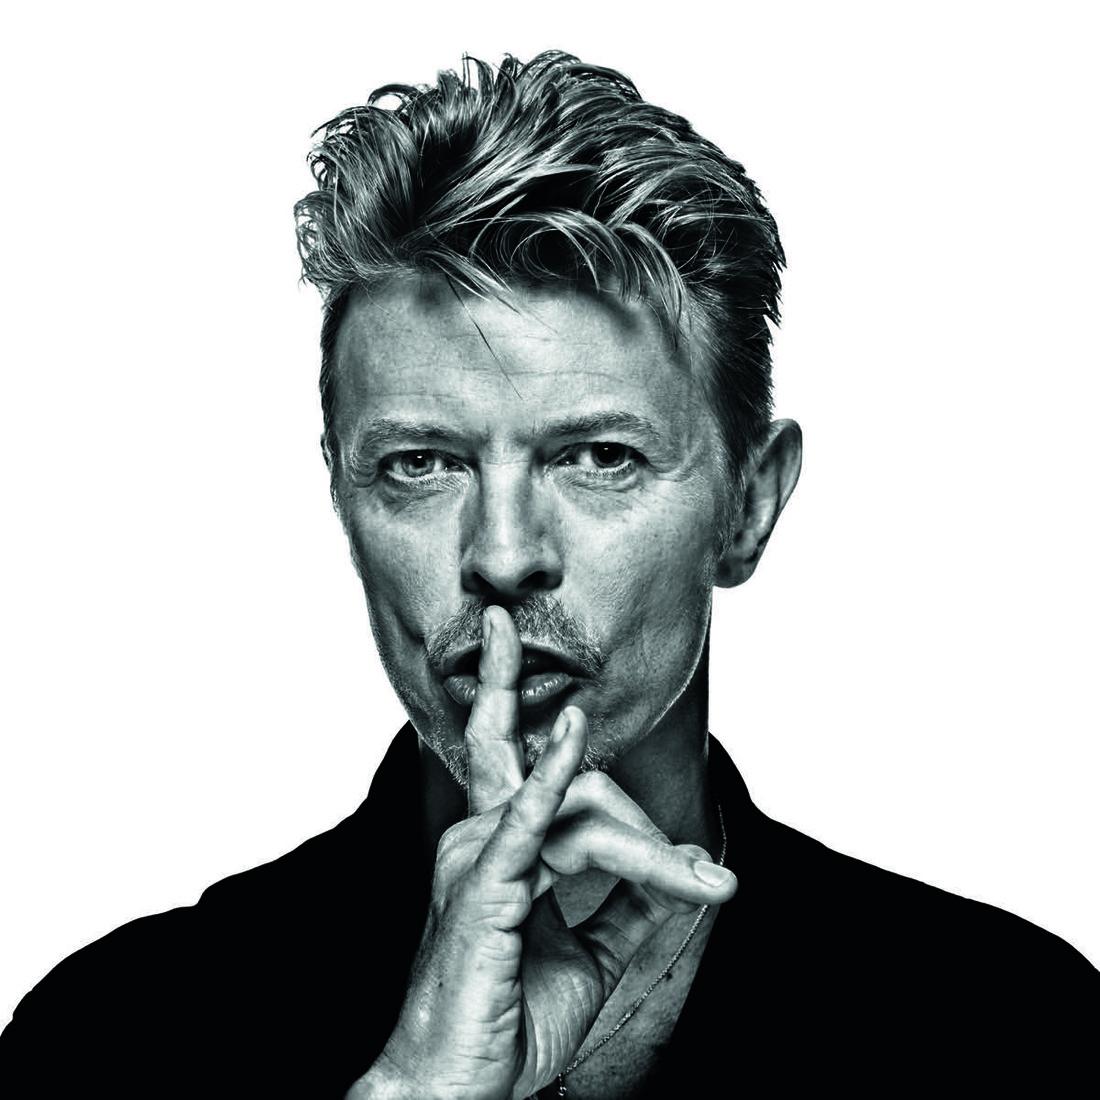 Portrait of David Bowie by Gavin Evans. © Gavin Evans, courtesy of Sotheby's.